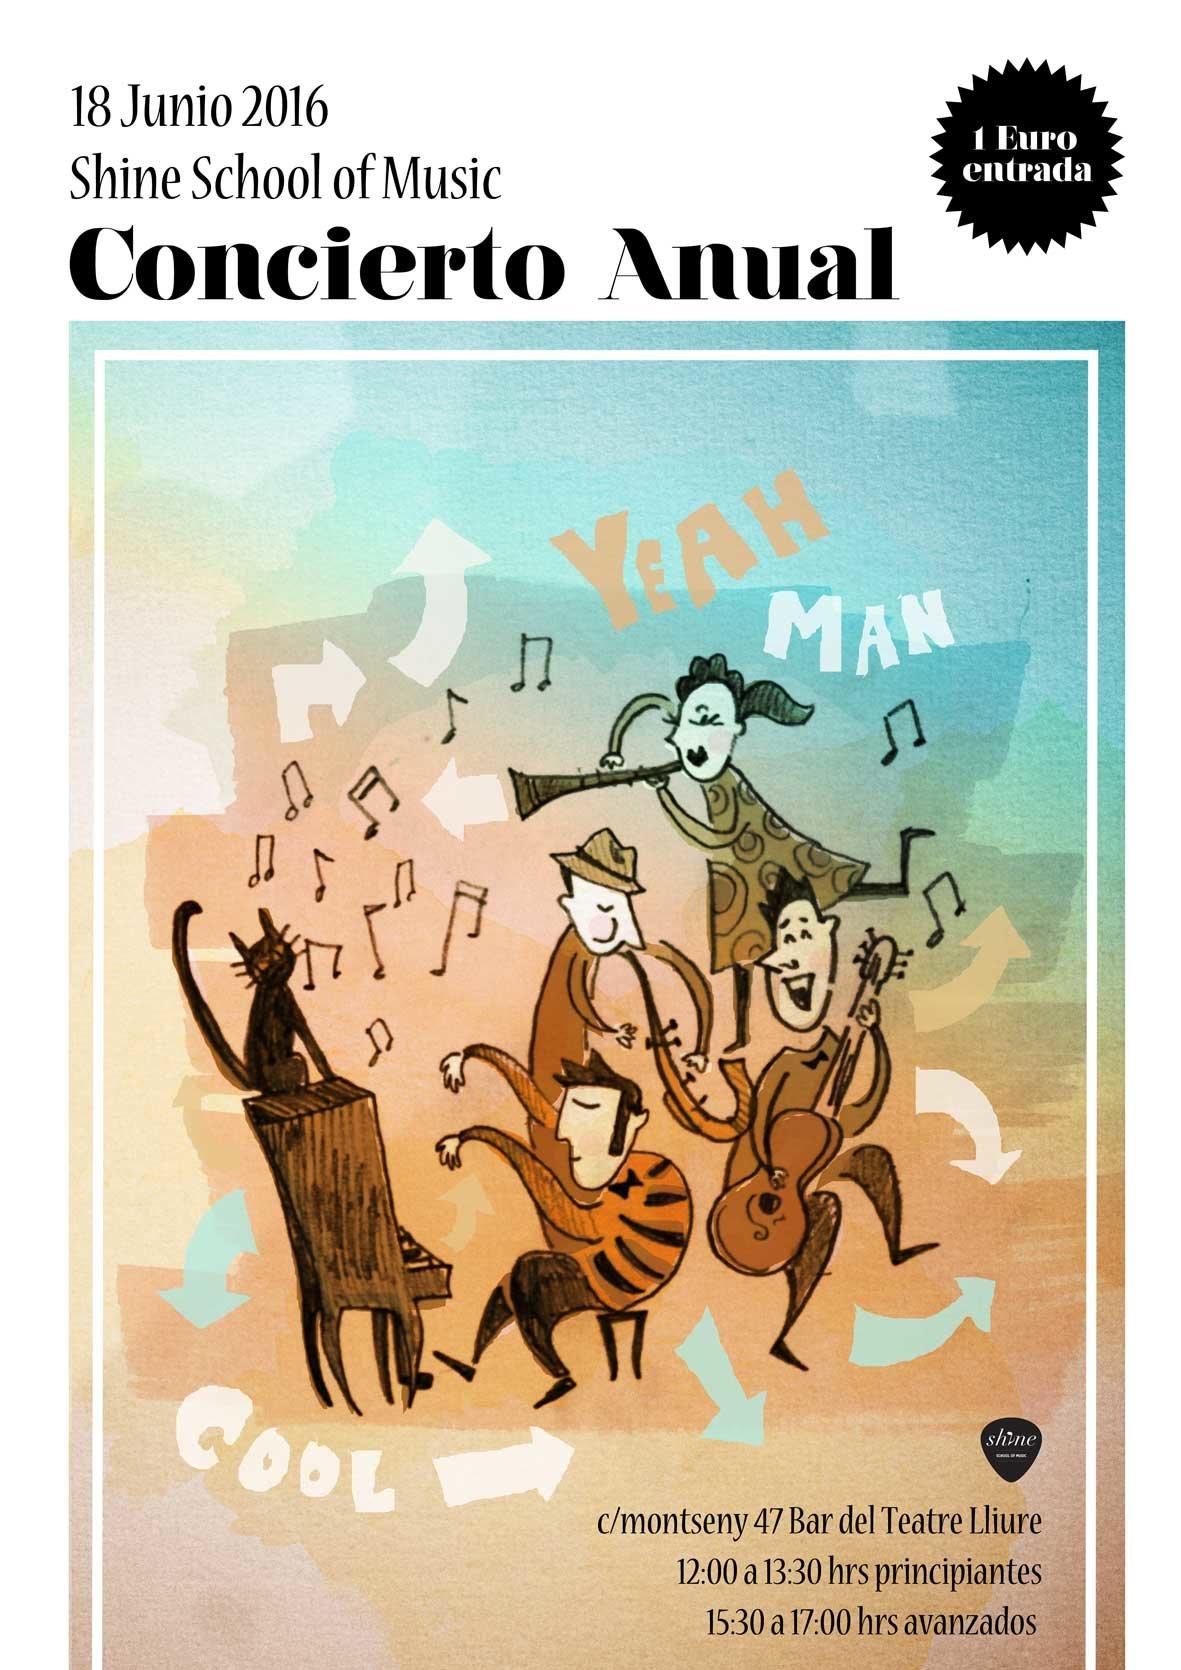 shine-concert-2016-postera3web